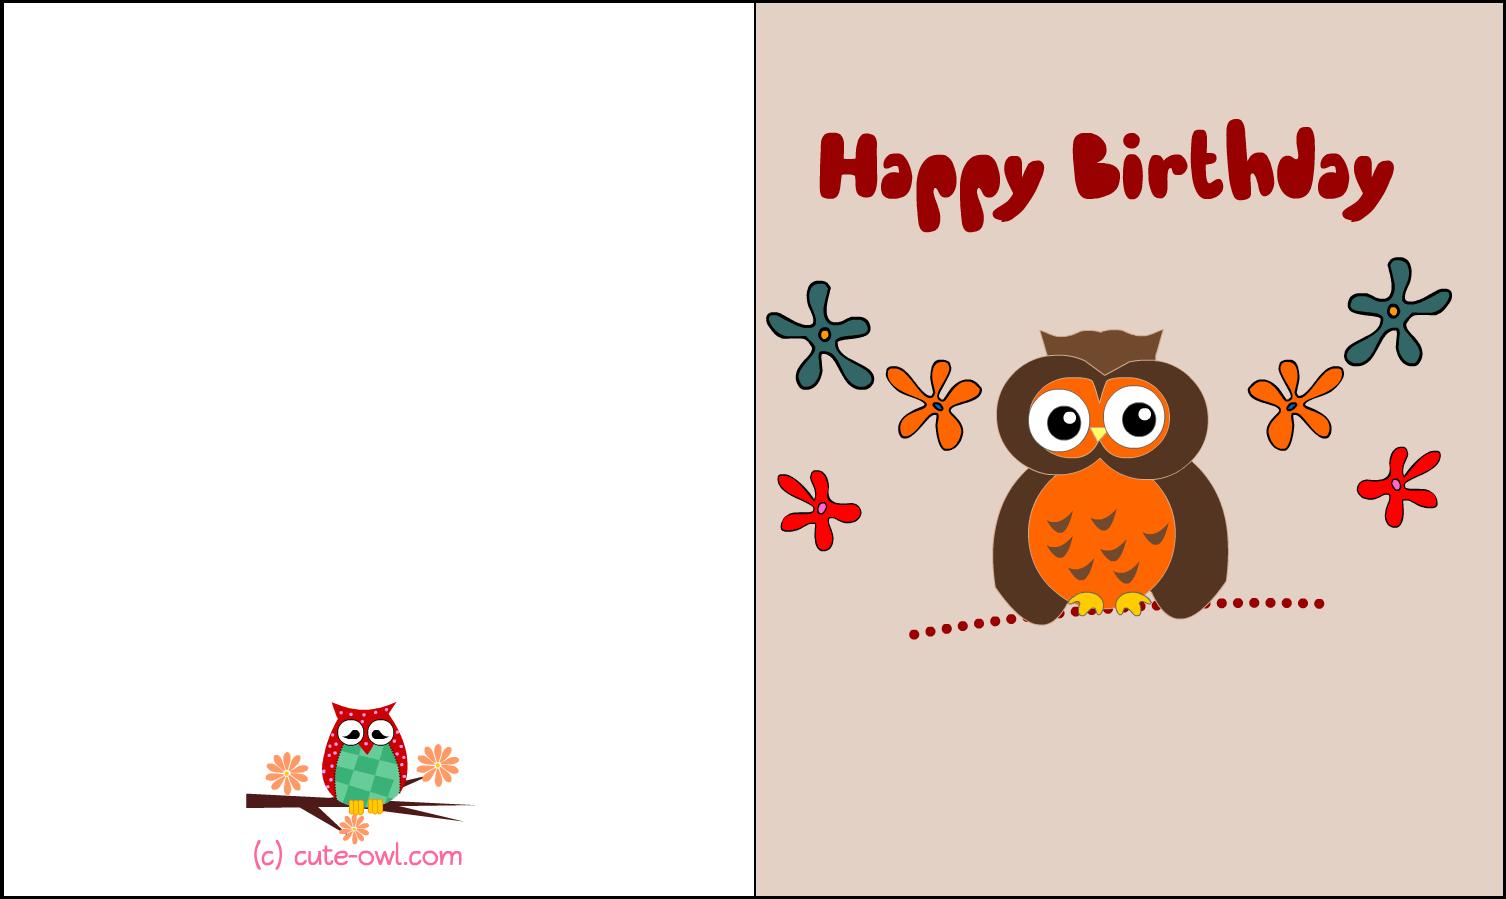 Download Free Printable Cute Owl Birthday Cards Printable Owl Birthday Card Png Image With No Background Pngkey Com